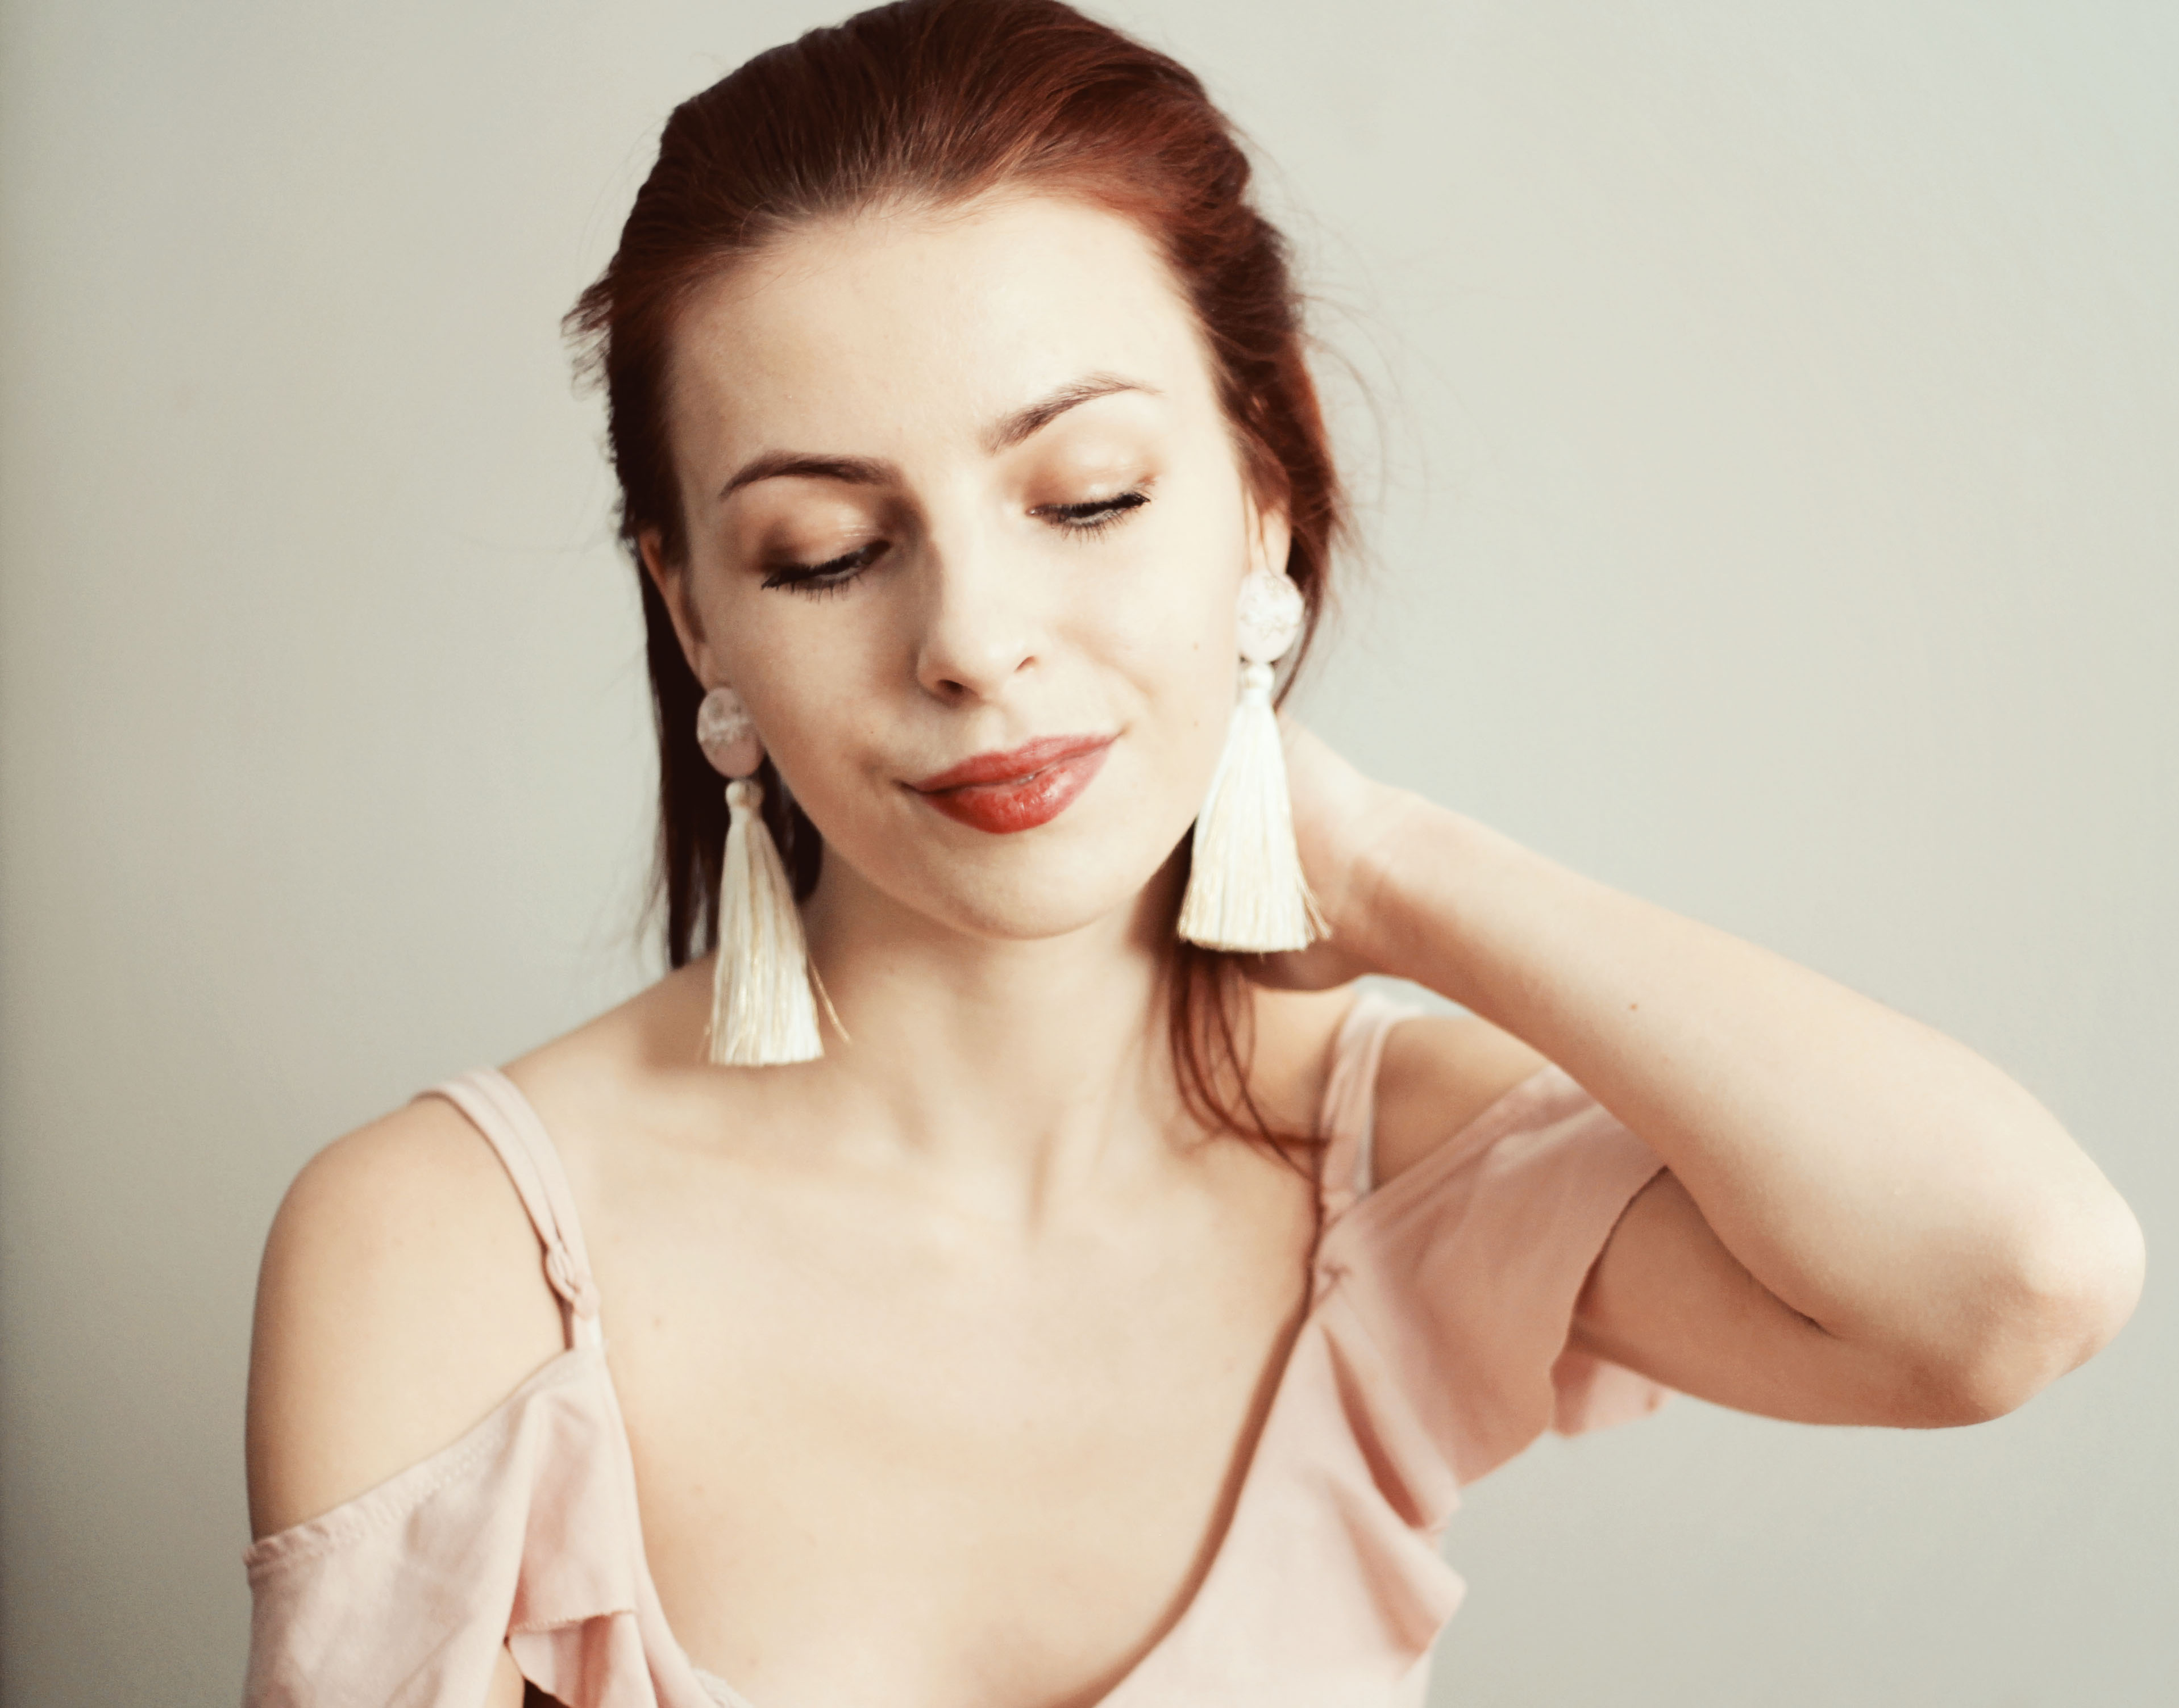 Moderné náušnice, z ktorých nebolia uši. Zoznámte sa s Petit.peanut